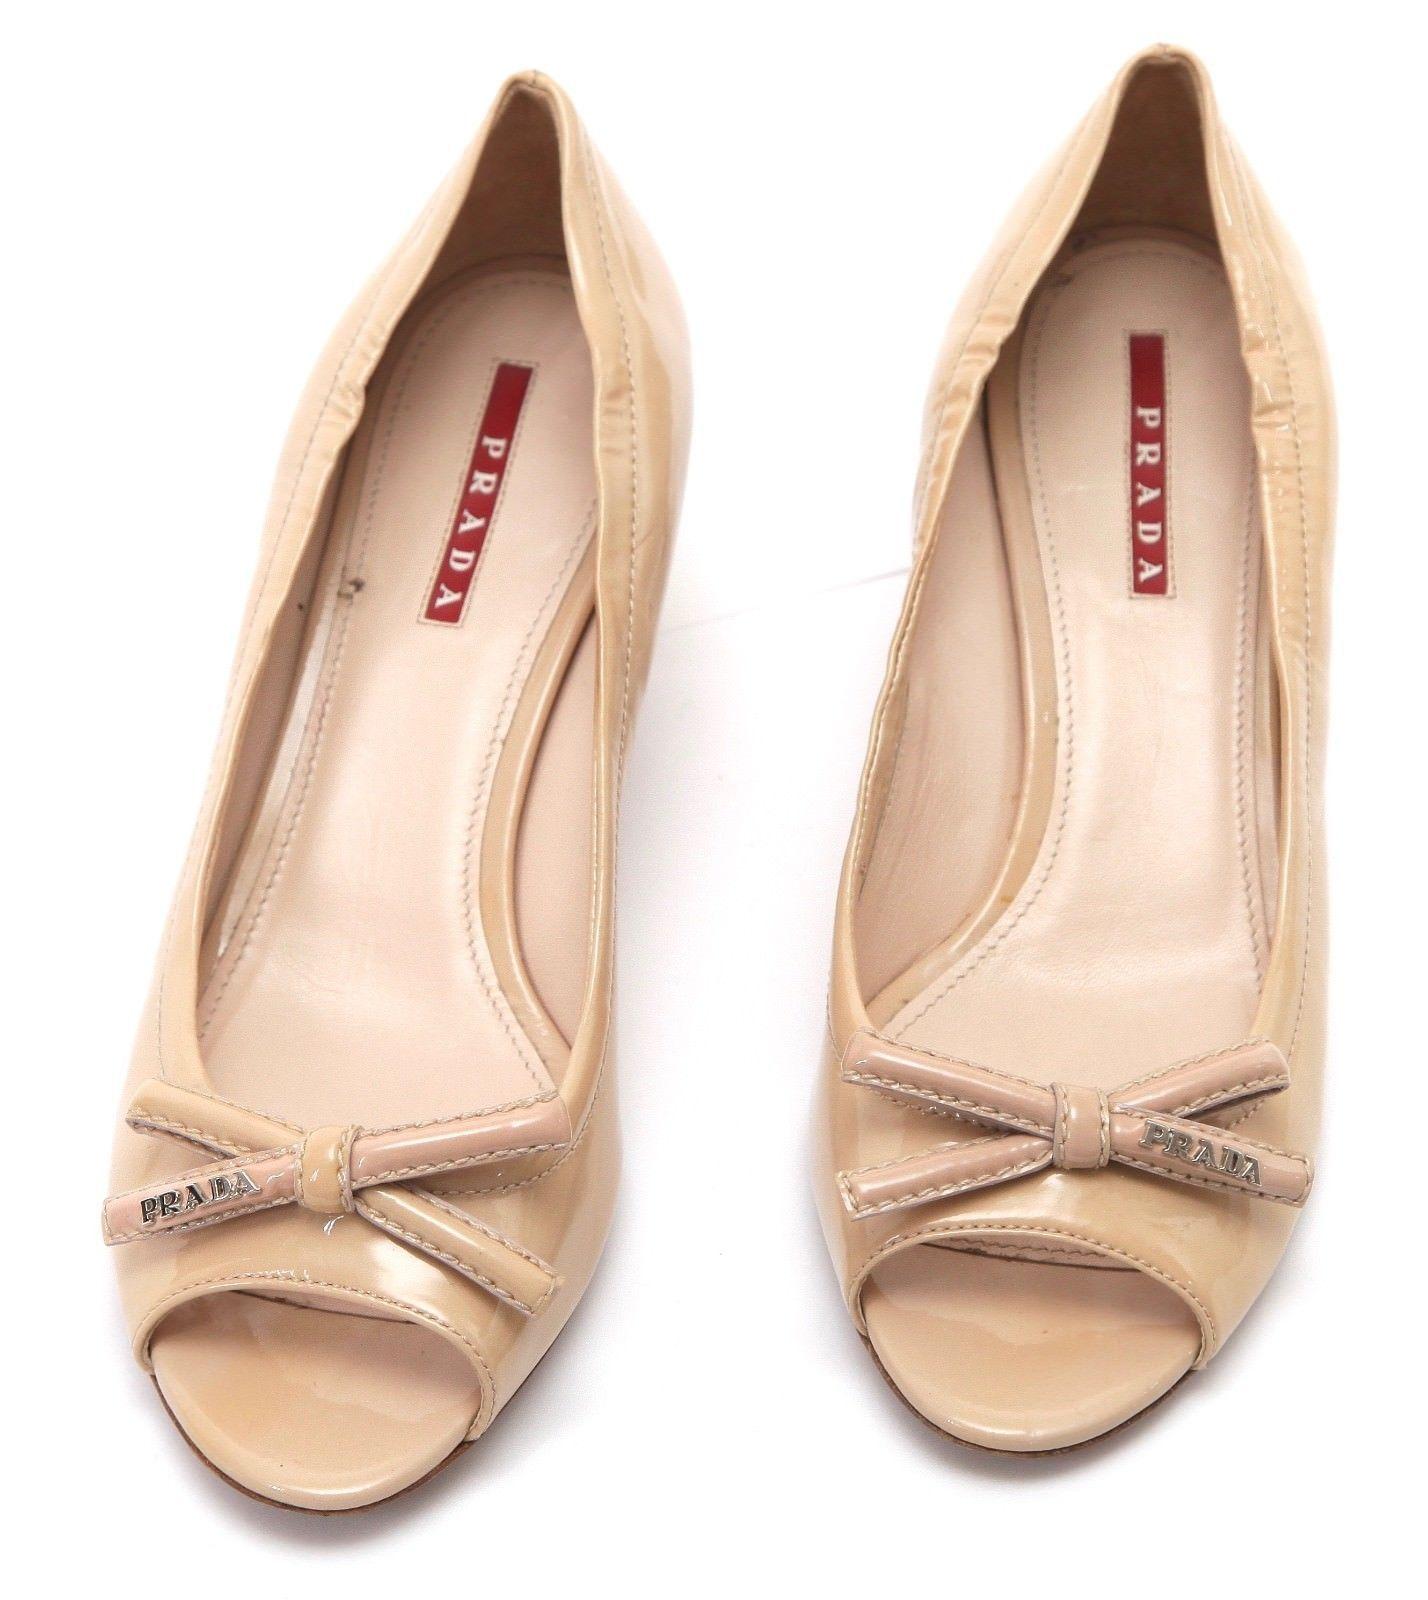 PRADA SPORT Patent Leather Nude Bow Peep Toe Pump Silver Kitten Heel Sz 37